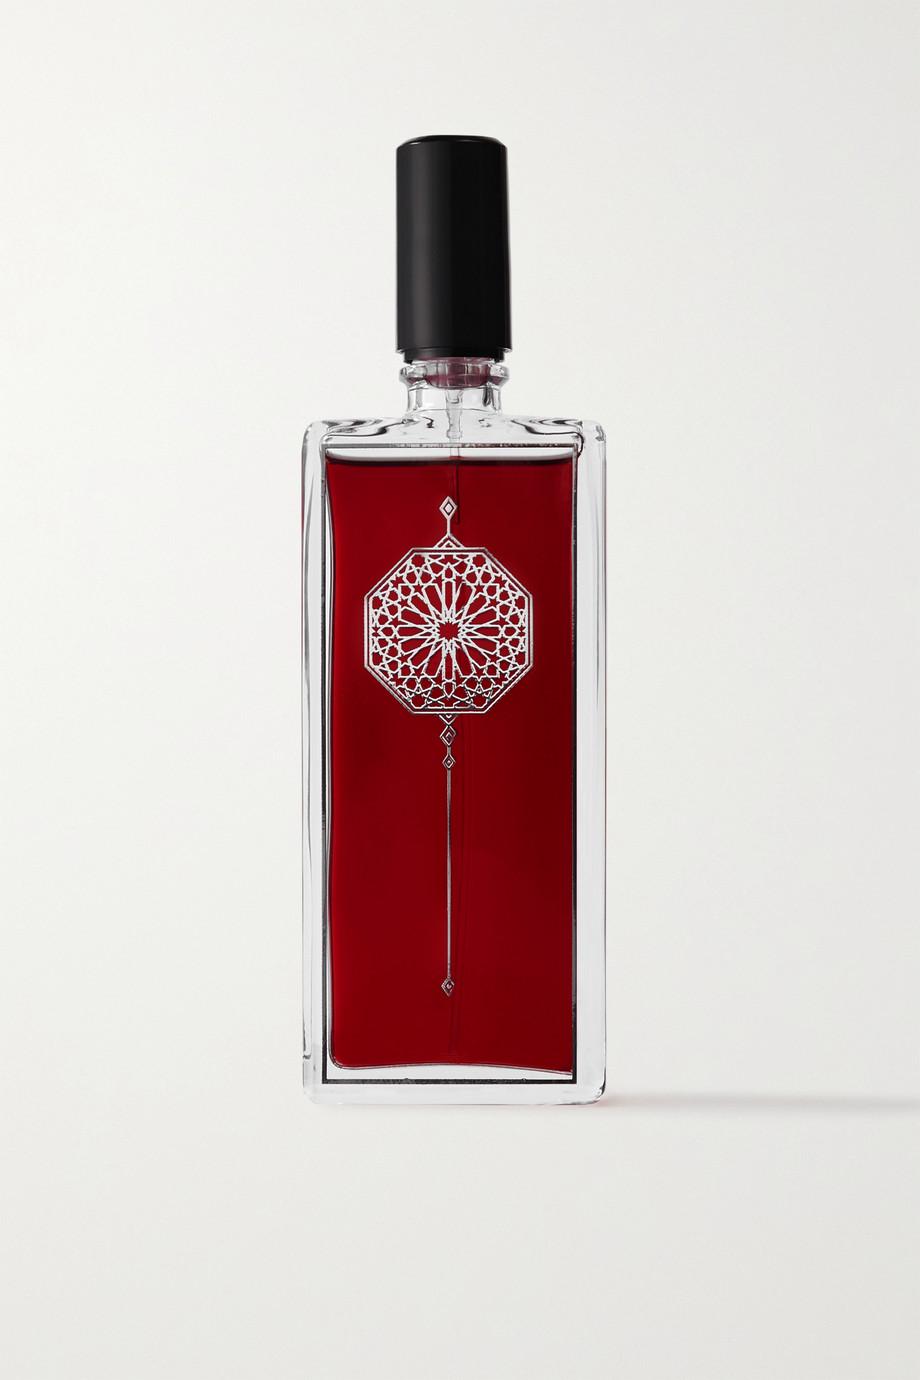 Serge Lutens Eau de Parfum - La Fille de Berlin, 50ml